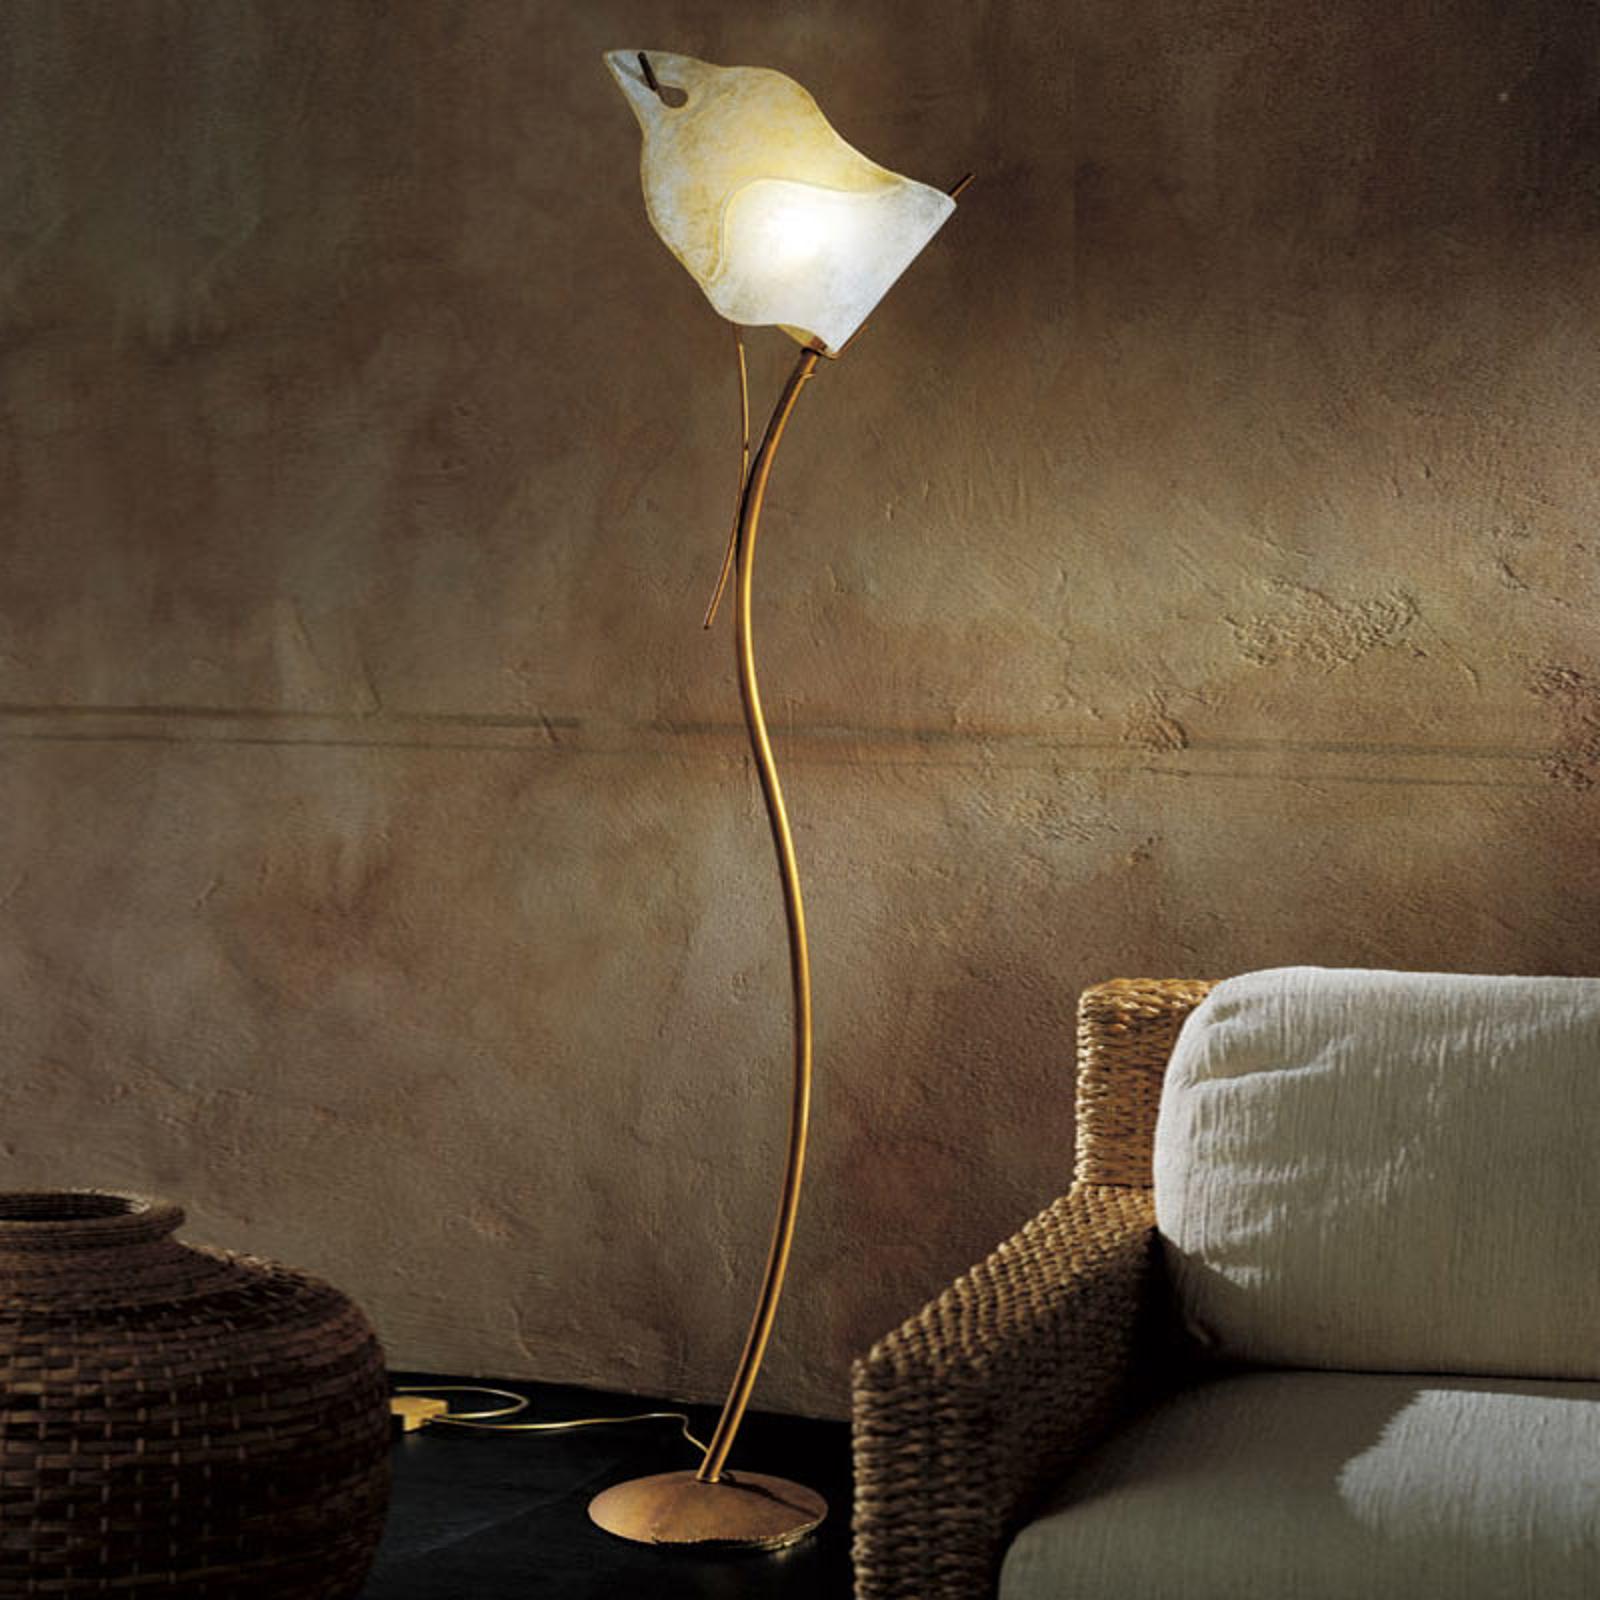 Extraordinaire lampadaire design FIRENZE